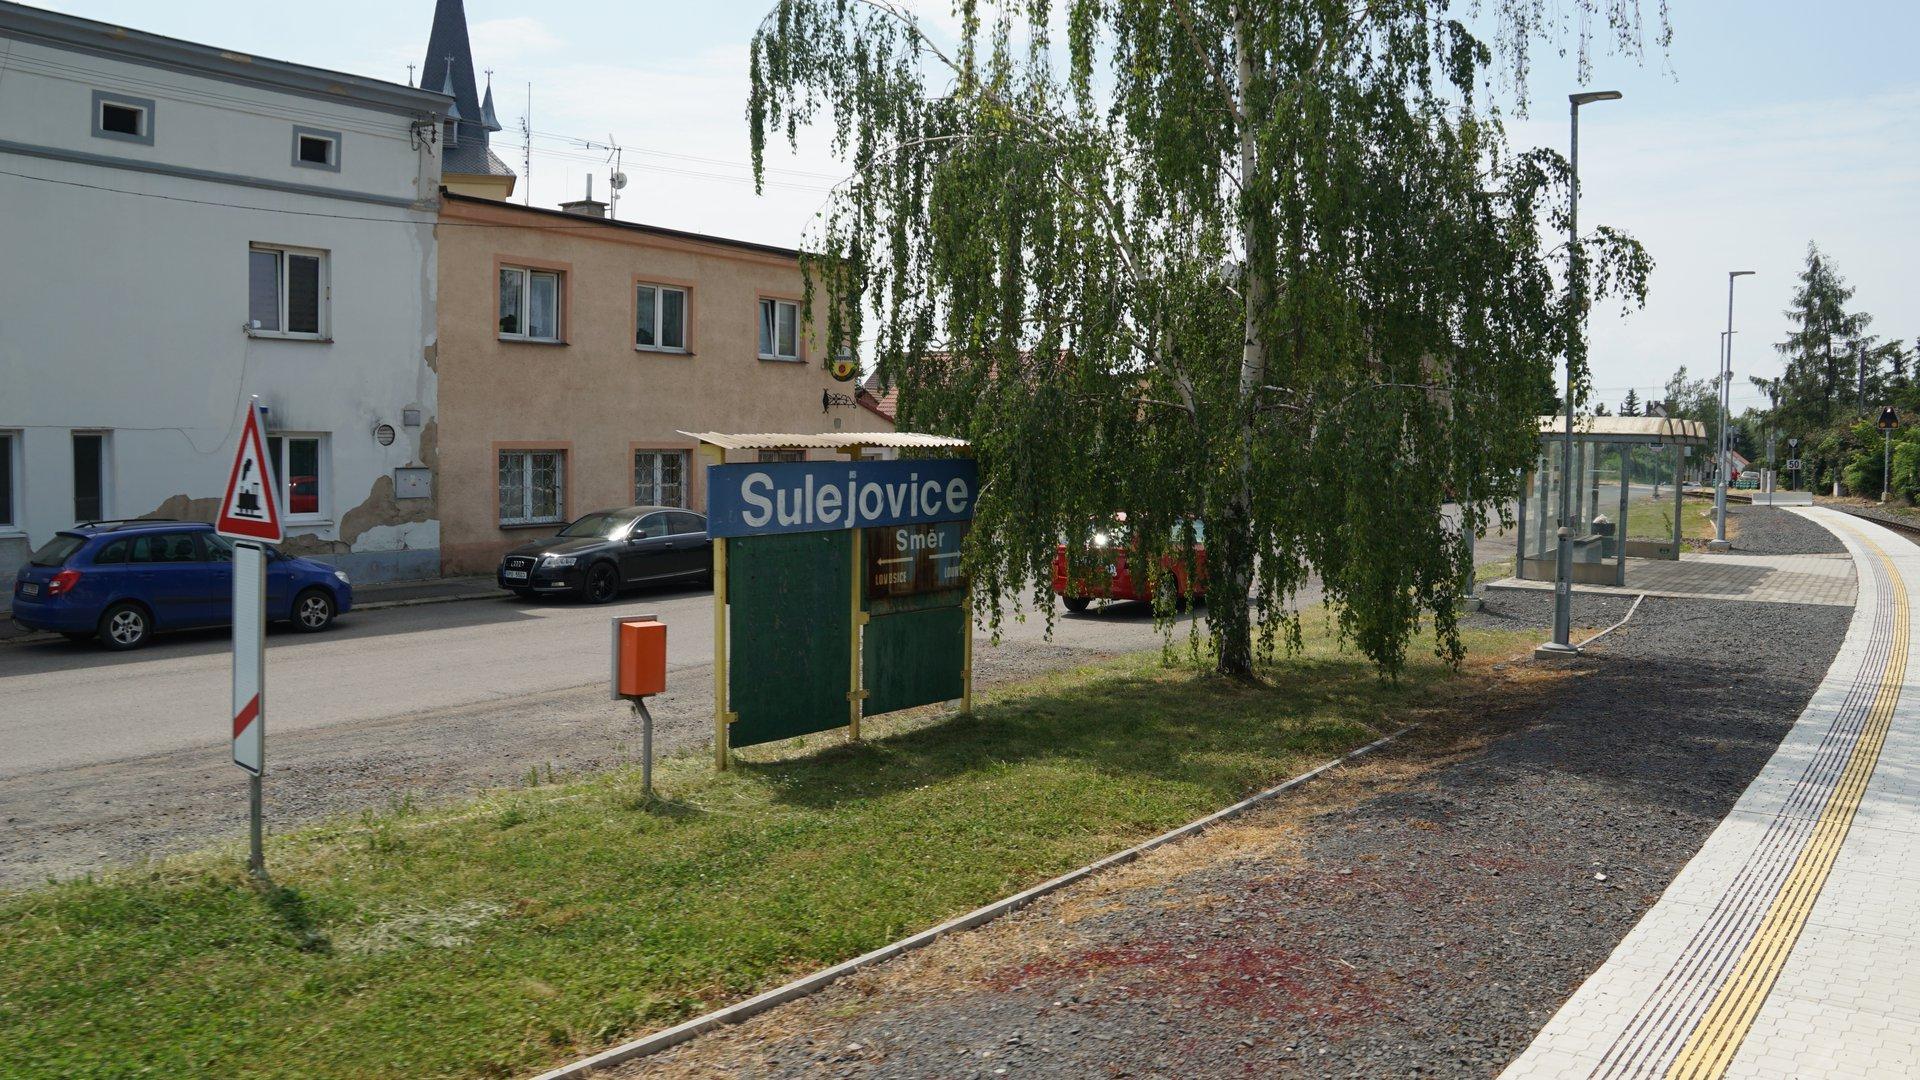 Sulejovice